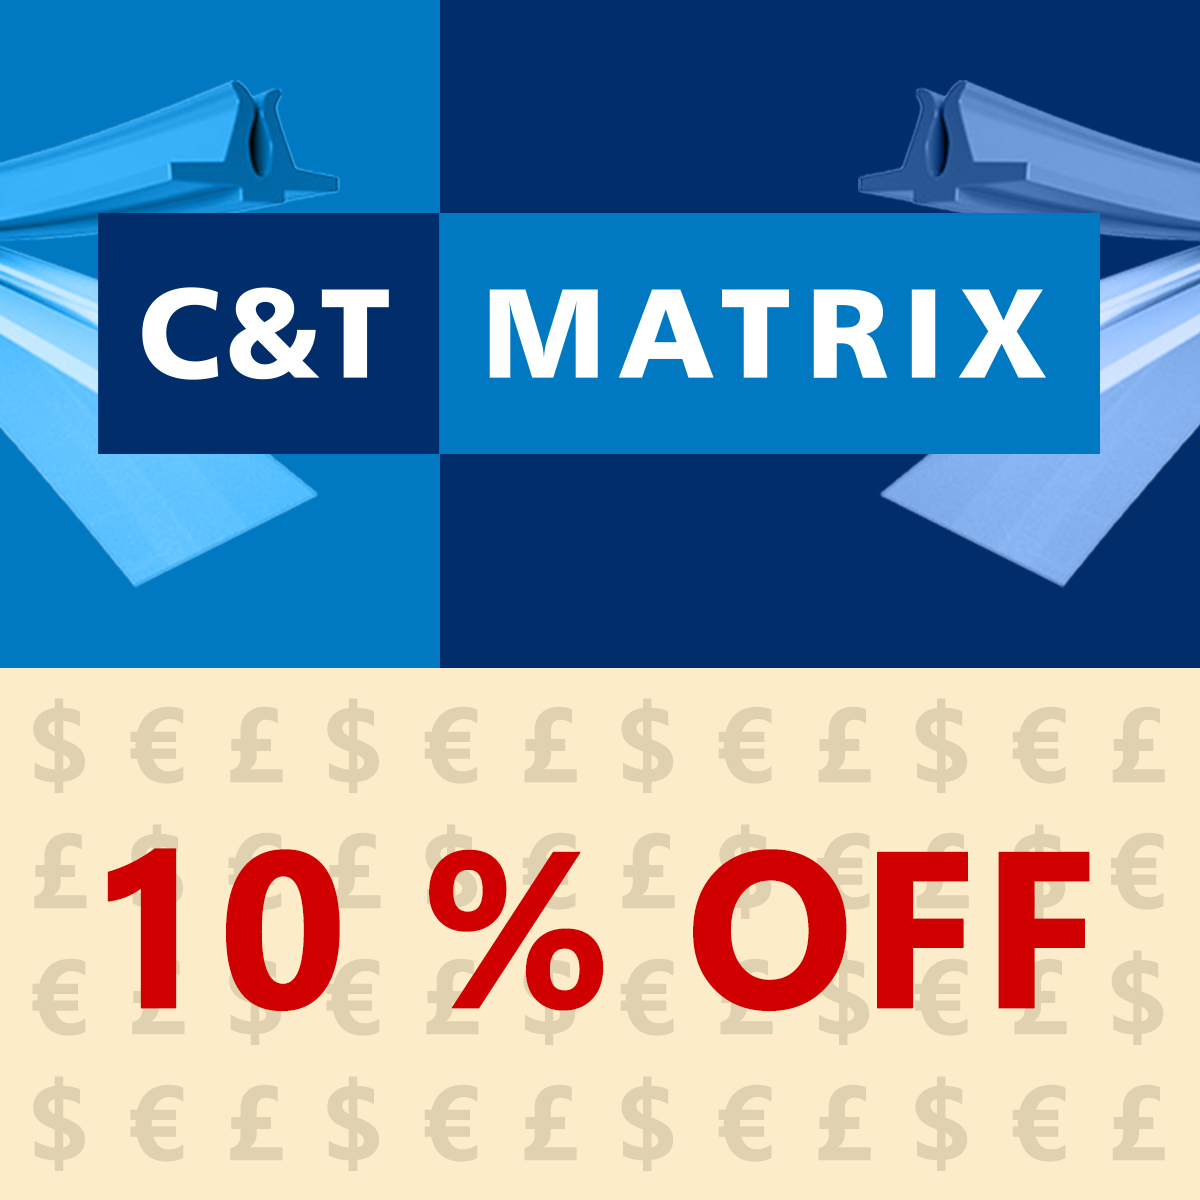 10% OFF C&T Creasing Matrix - Steel, XTC, Corrugate, PINK